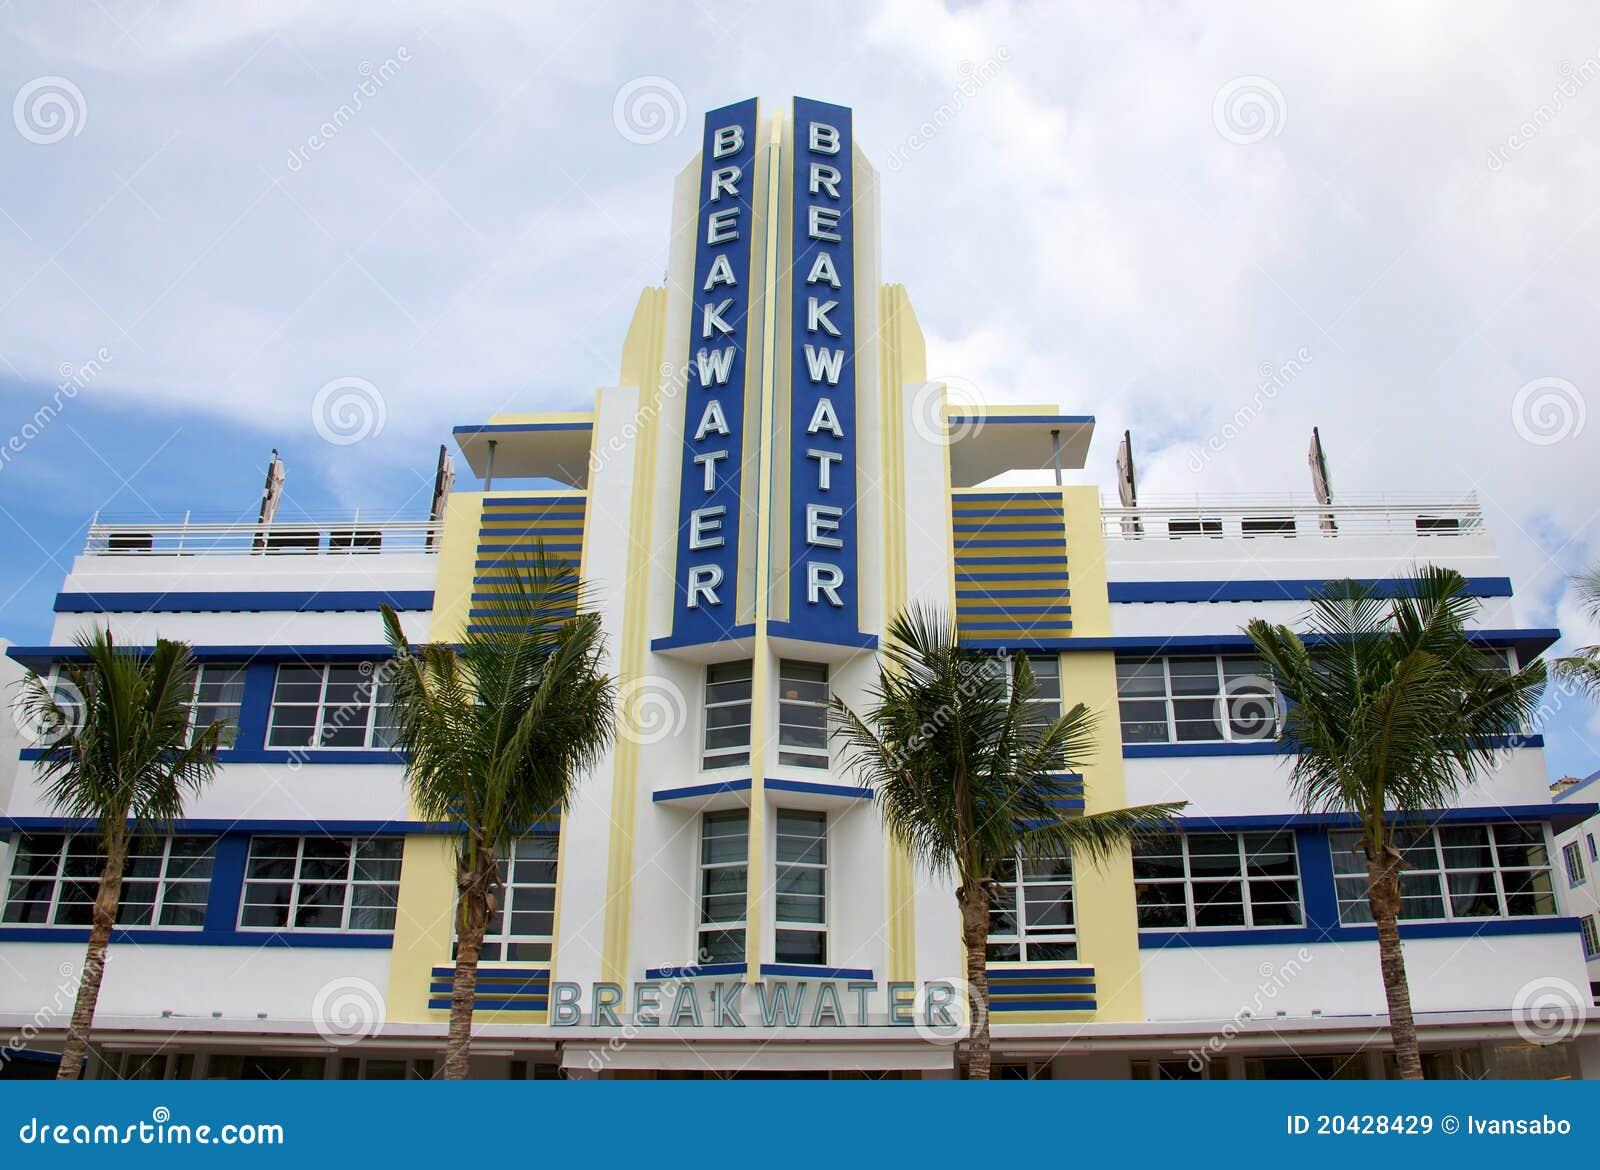 breakwater hotel south beach miami editorial stock image